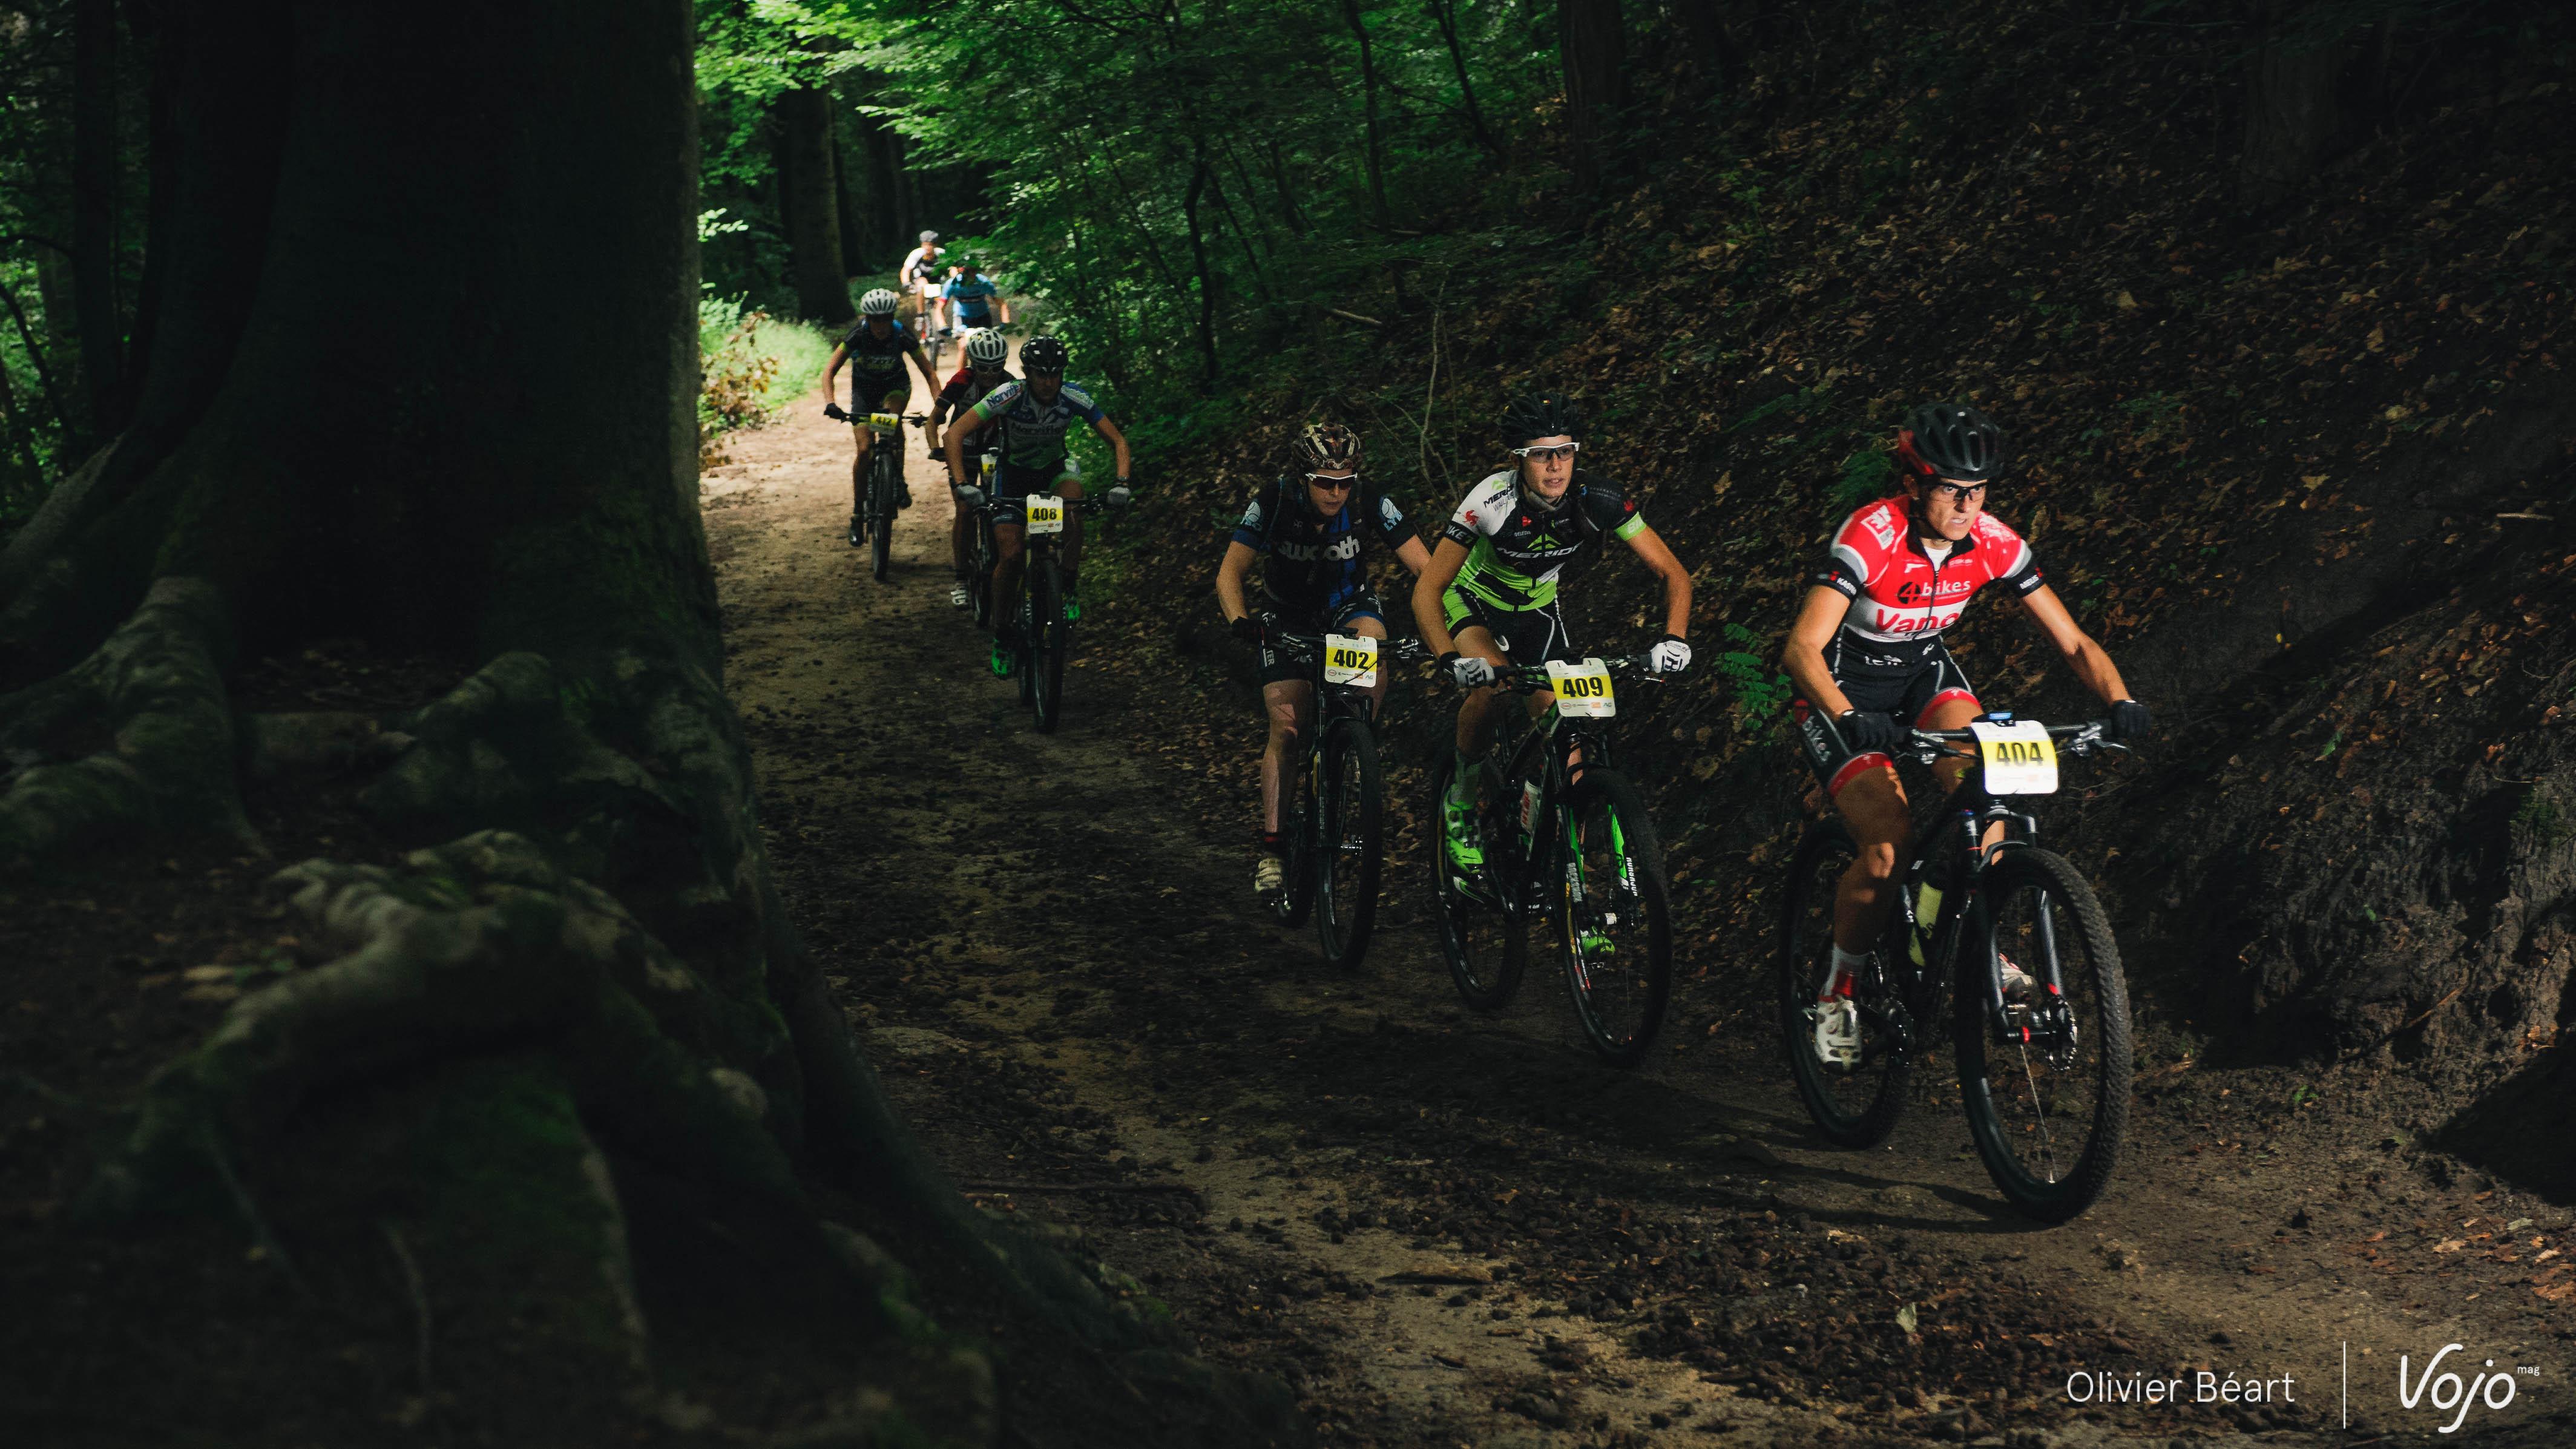 Championnat_Belgique_BK_Marathon_Ottignies_2015_Hommes_Copyright_OBeart_VojoMag-2